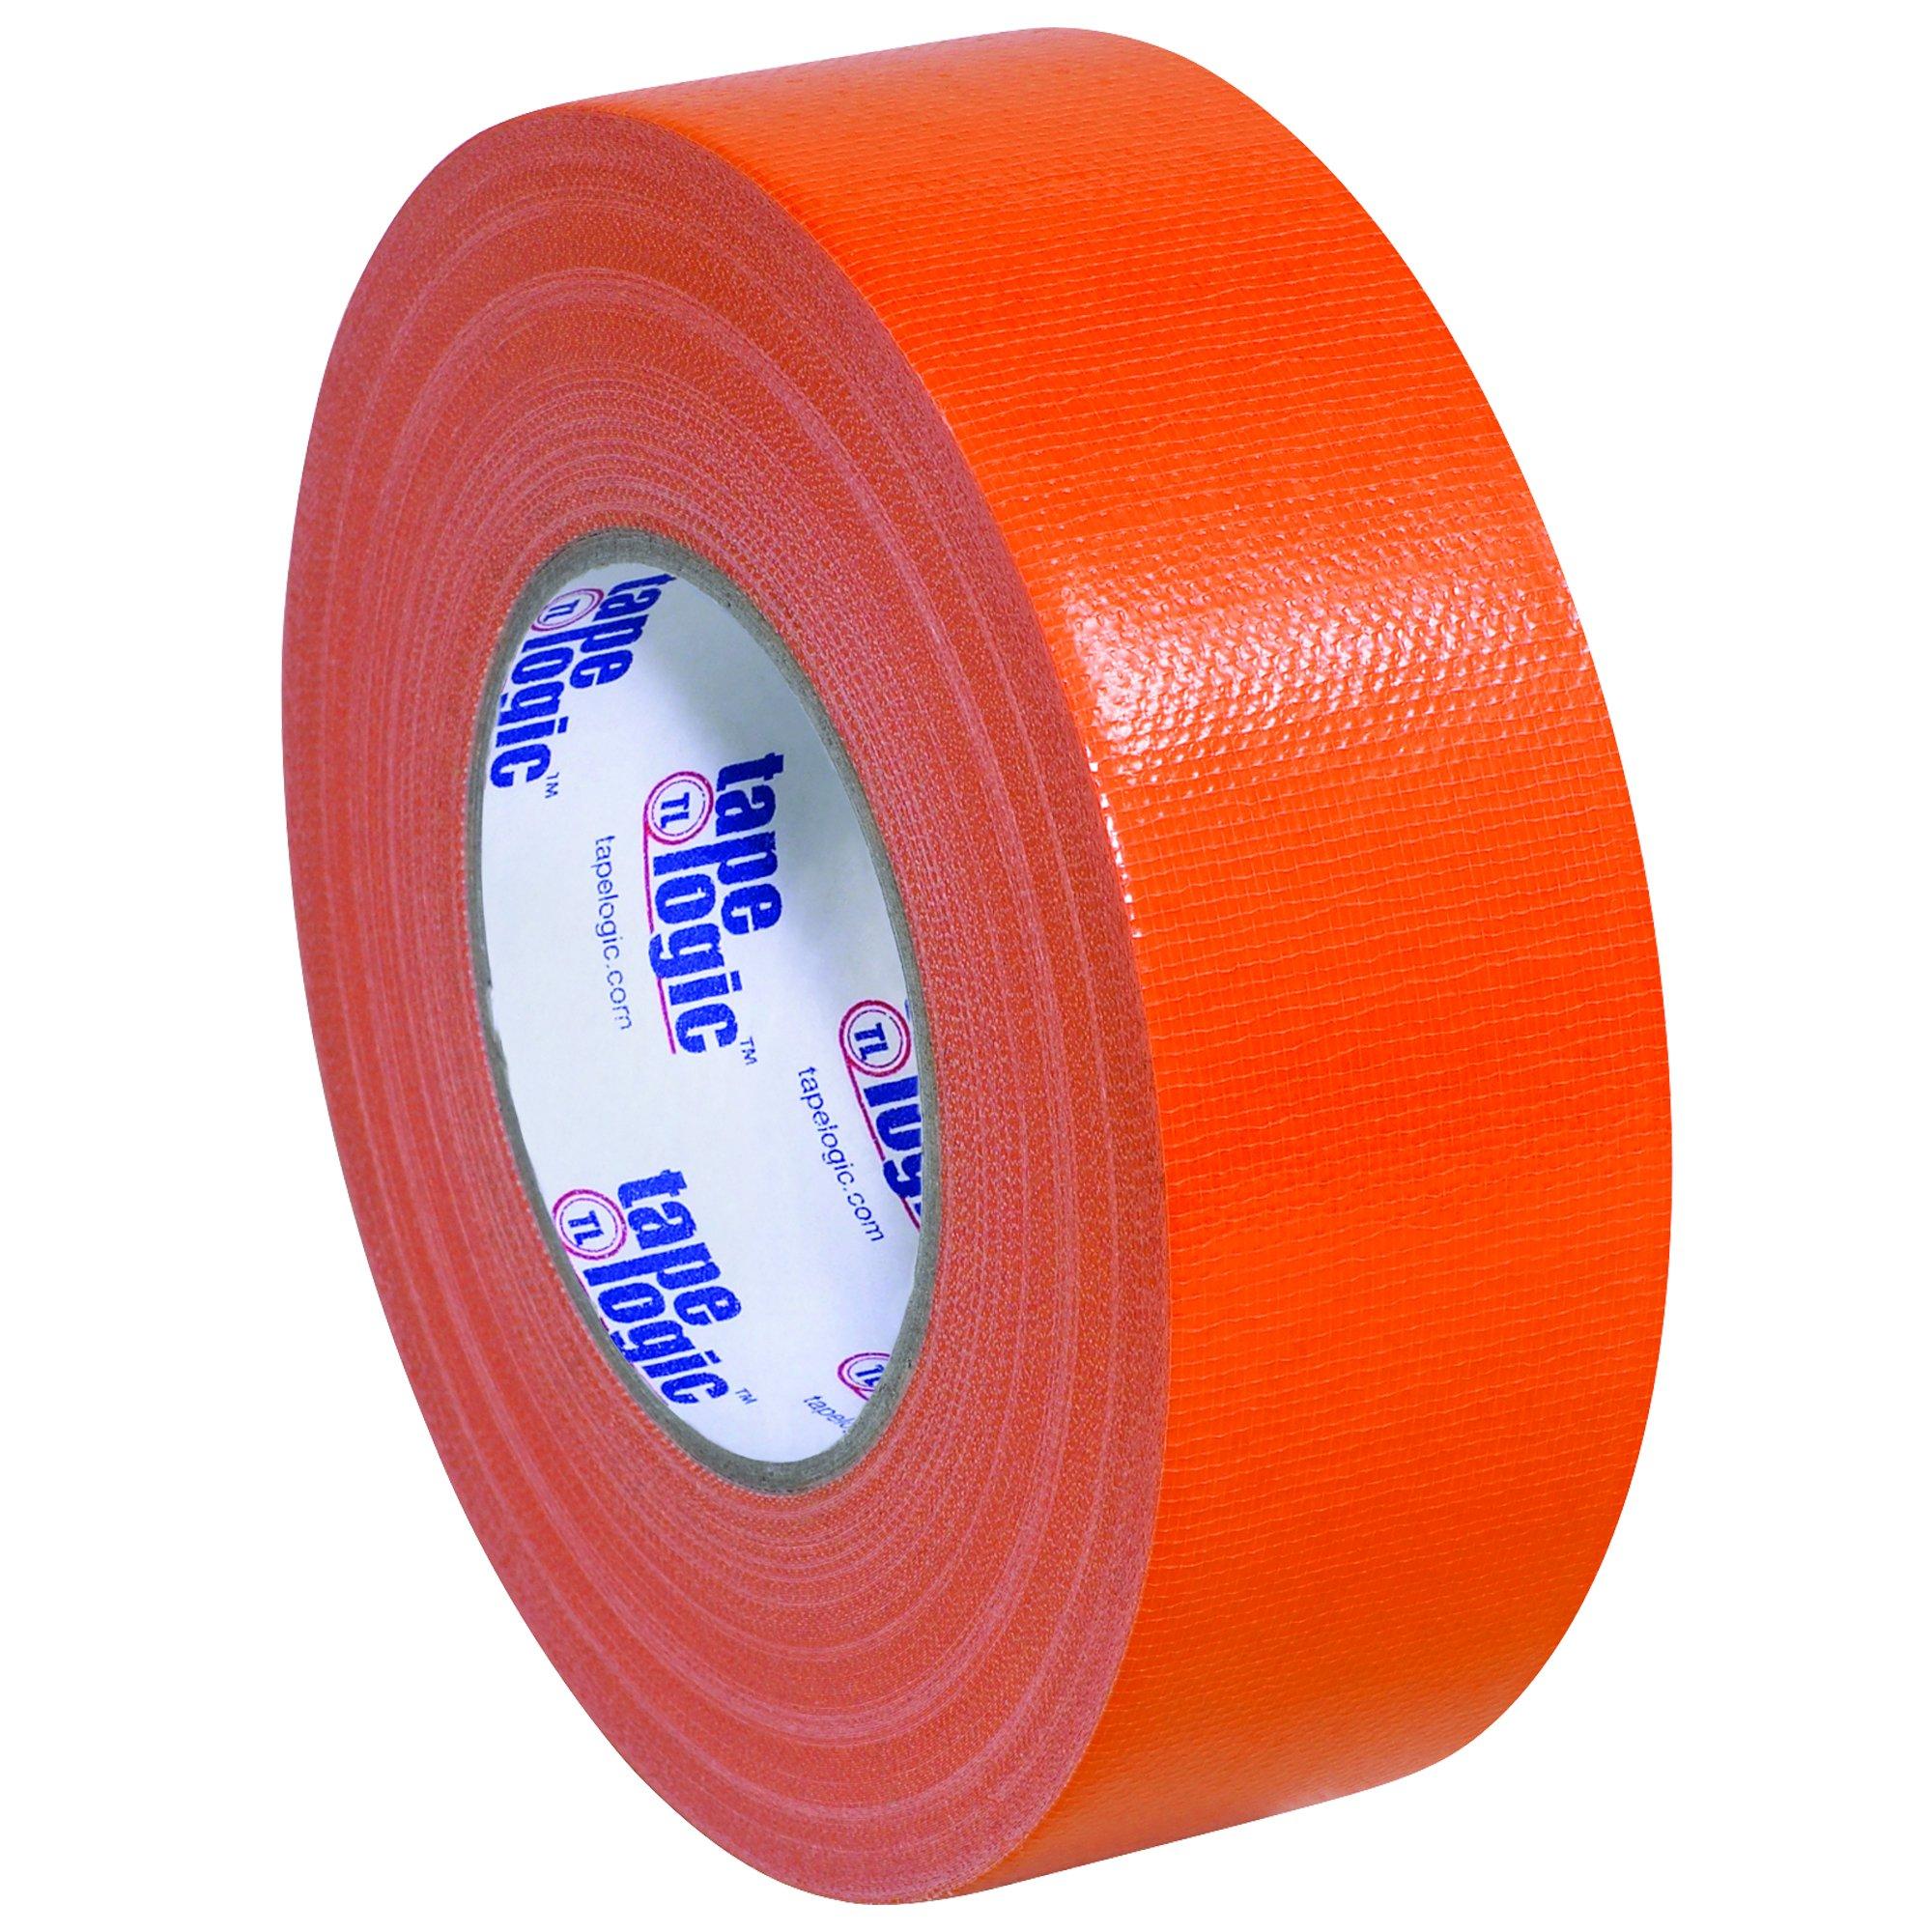 BOX USA BT987100RN Orange Tape Logic Duct Tape, 10 mil, 2'' x 60 yd. (Pack of 24)